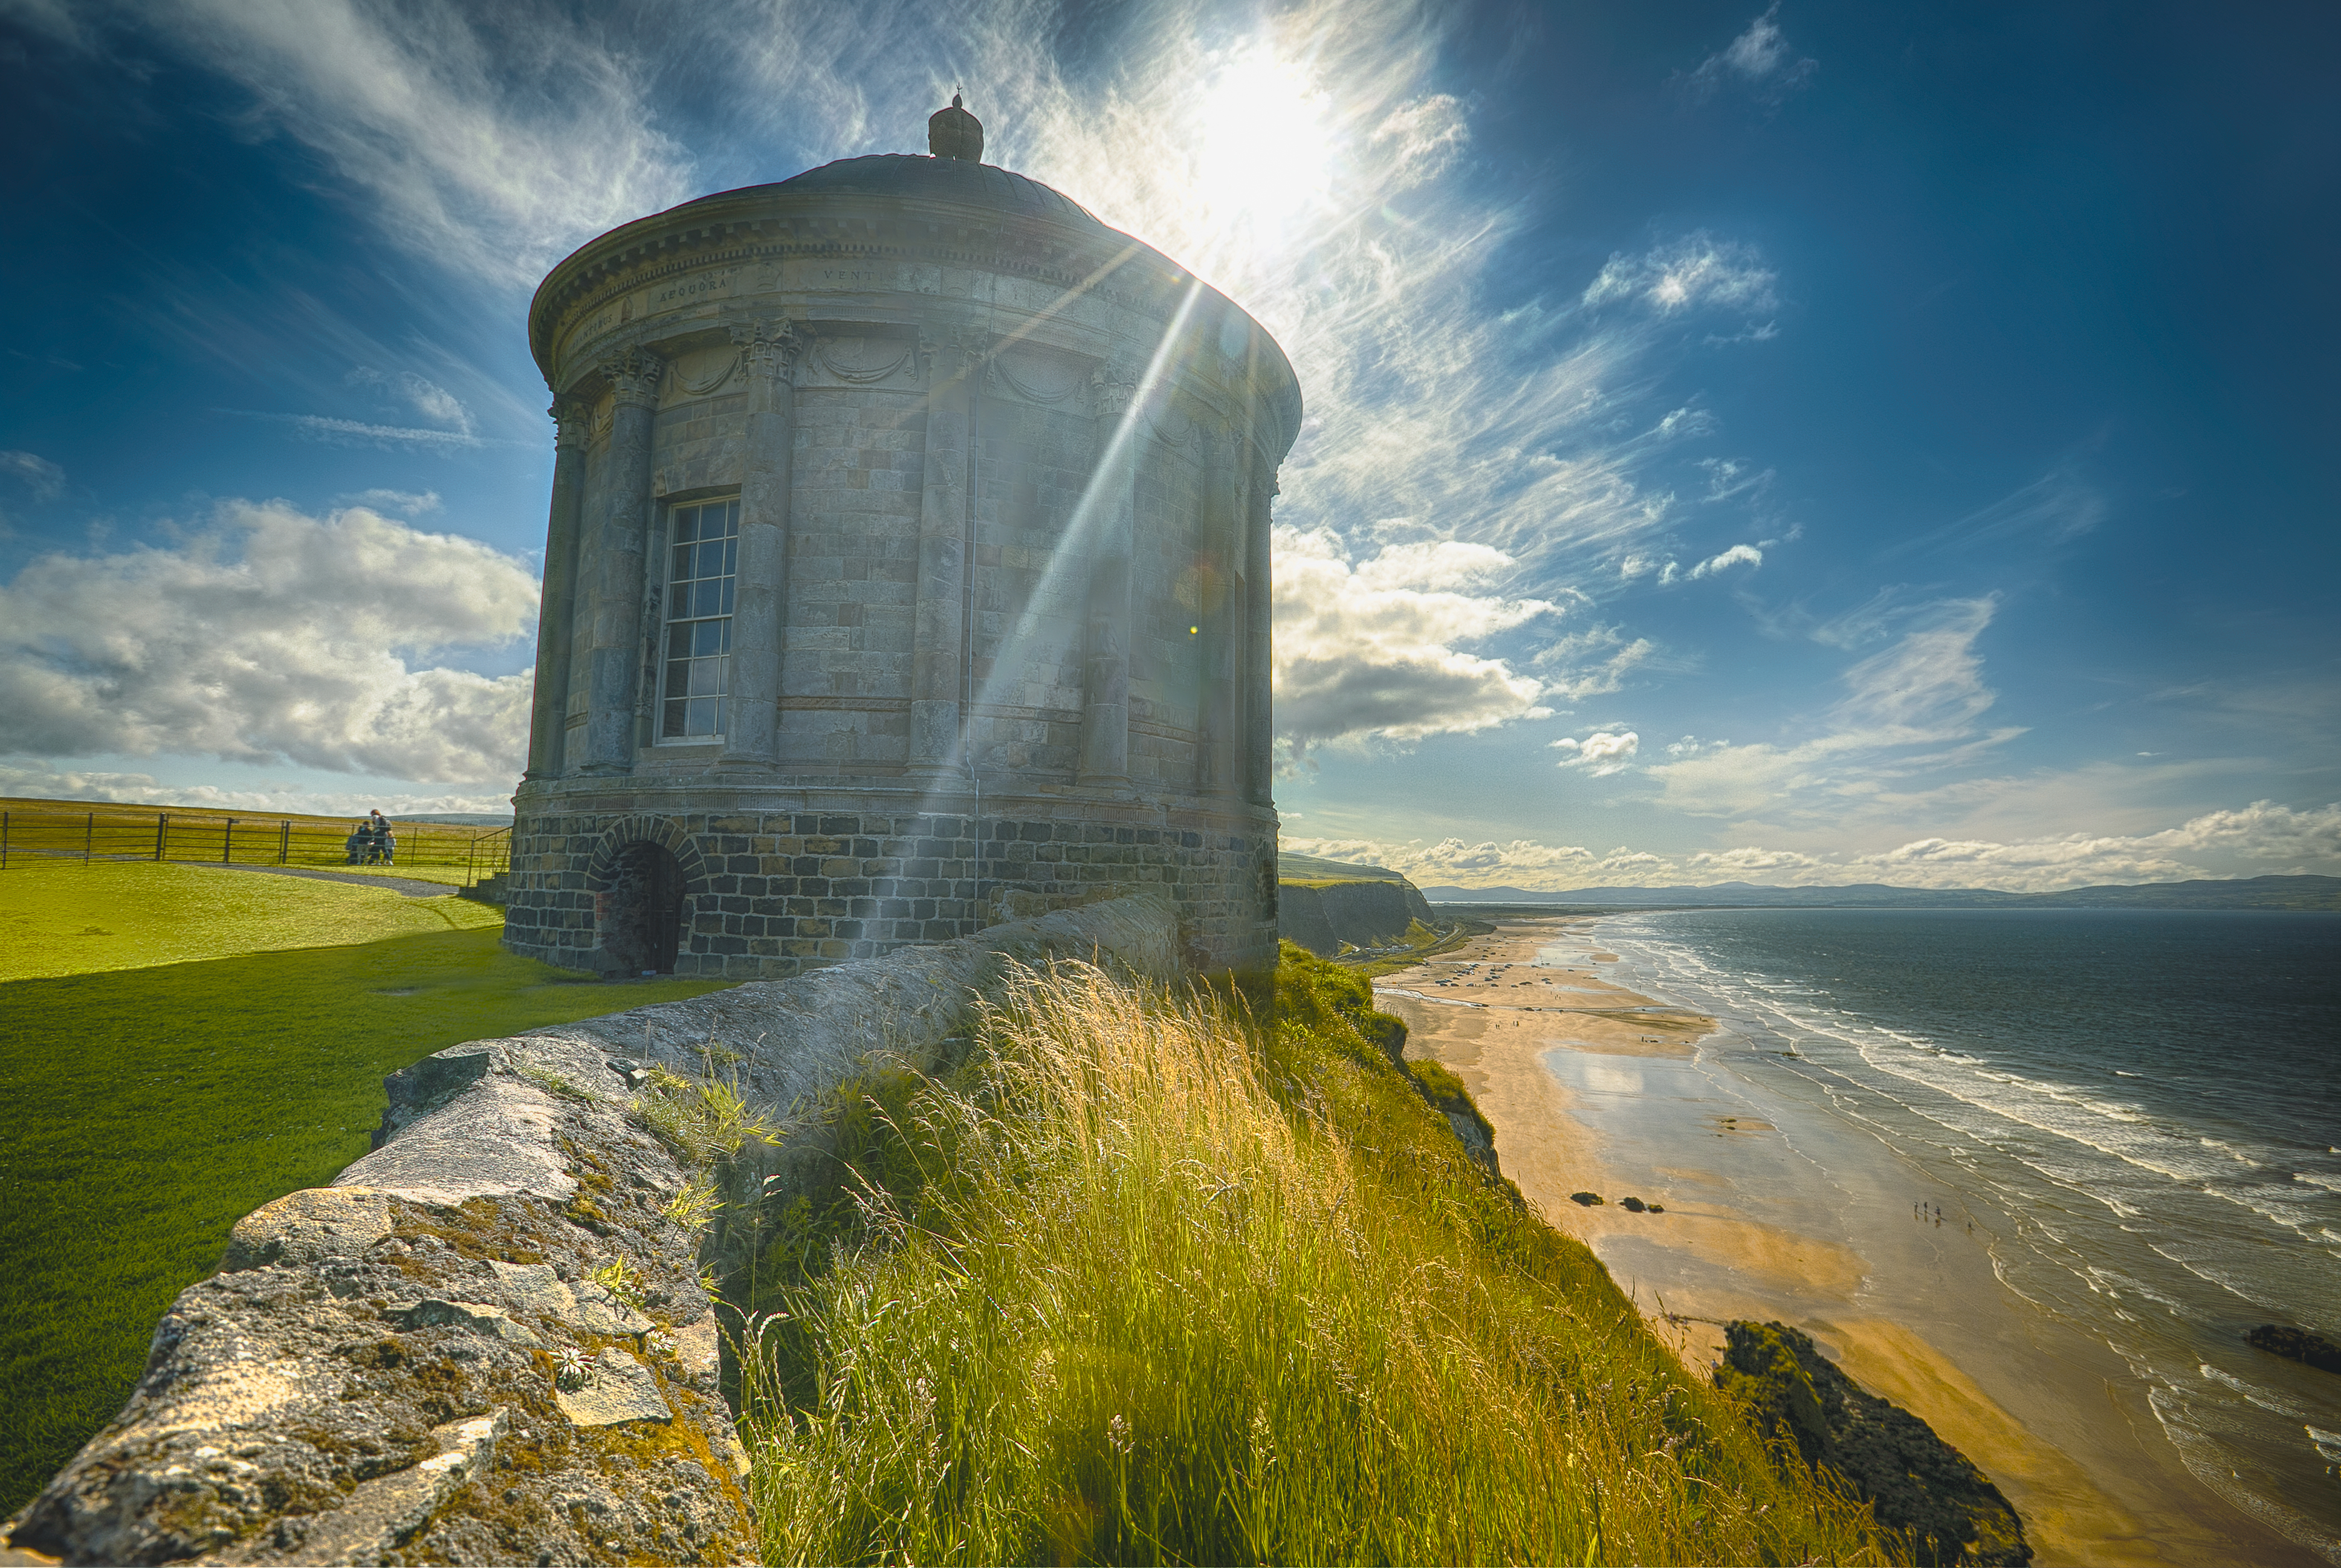 Noord-Ierland, Mussenden Temple, Vakantie ierland